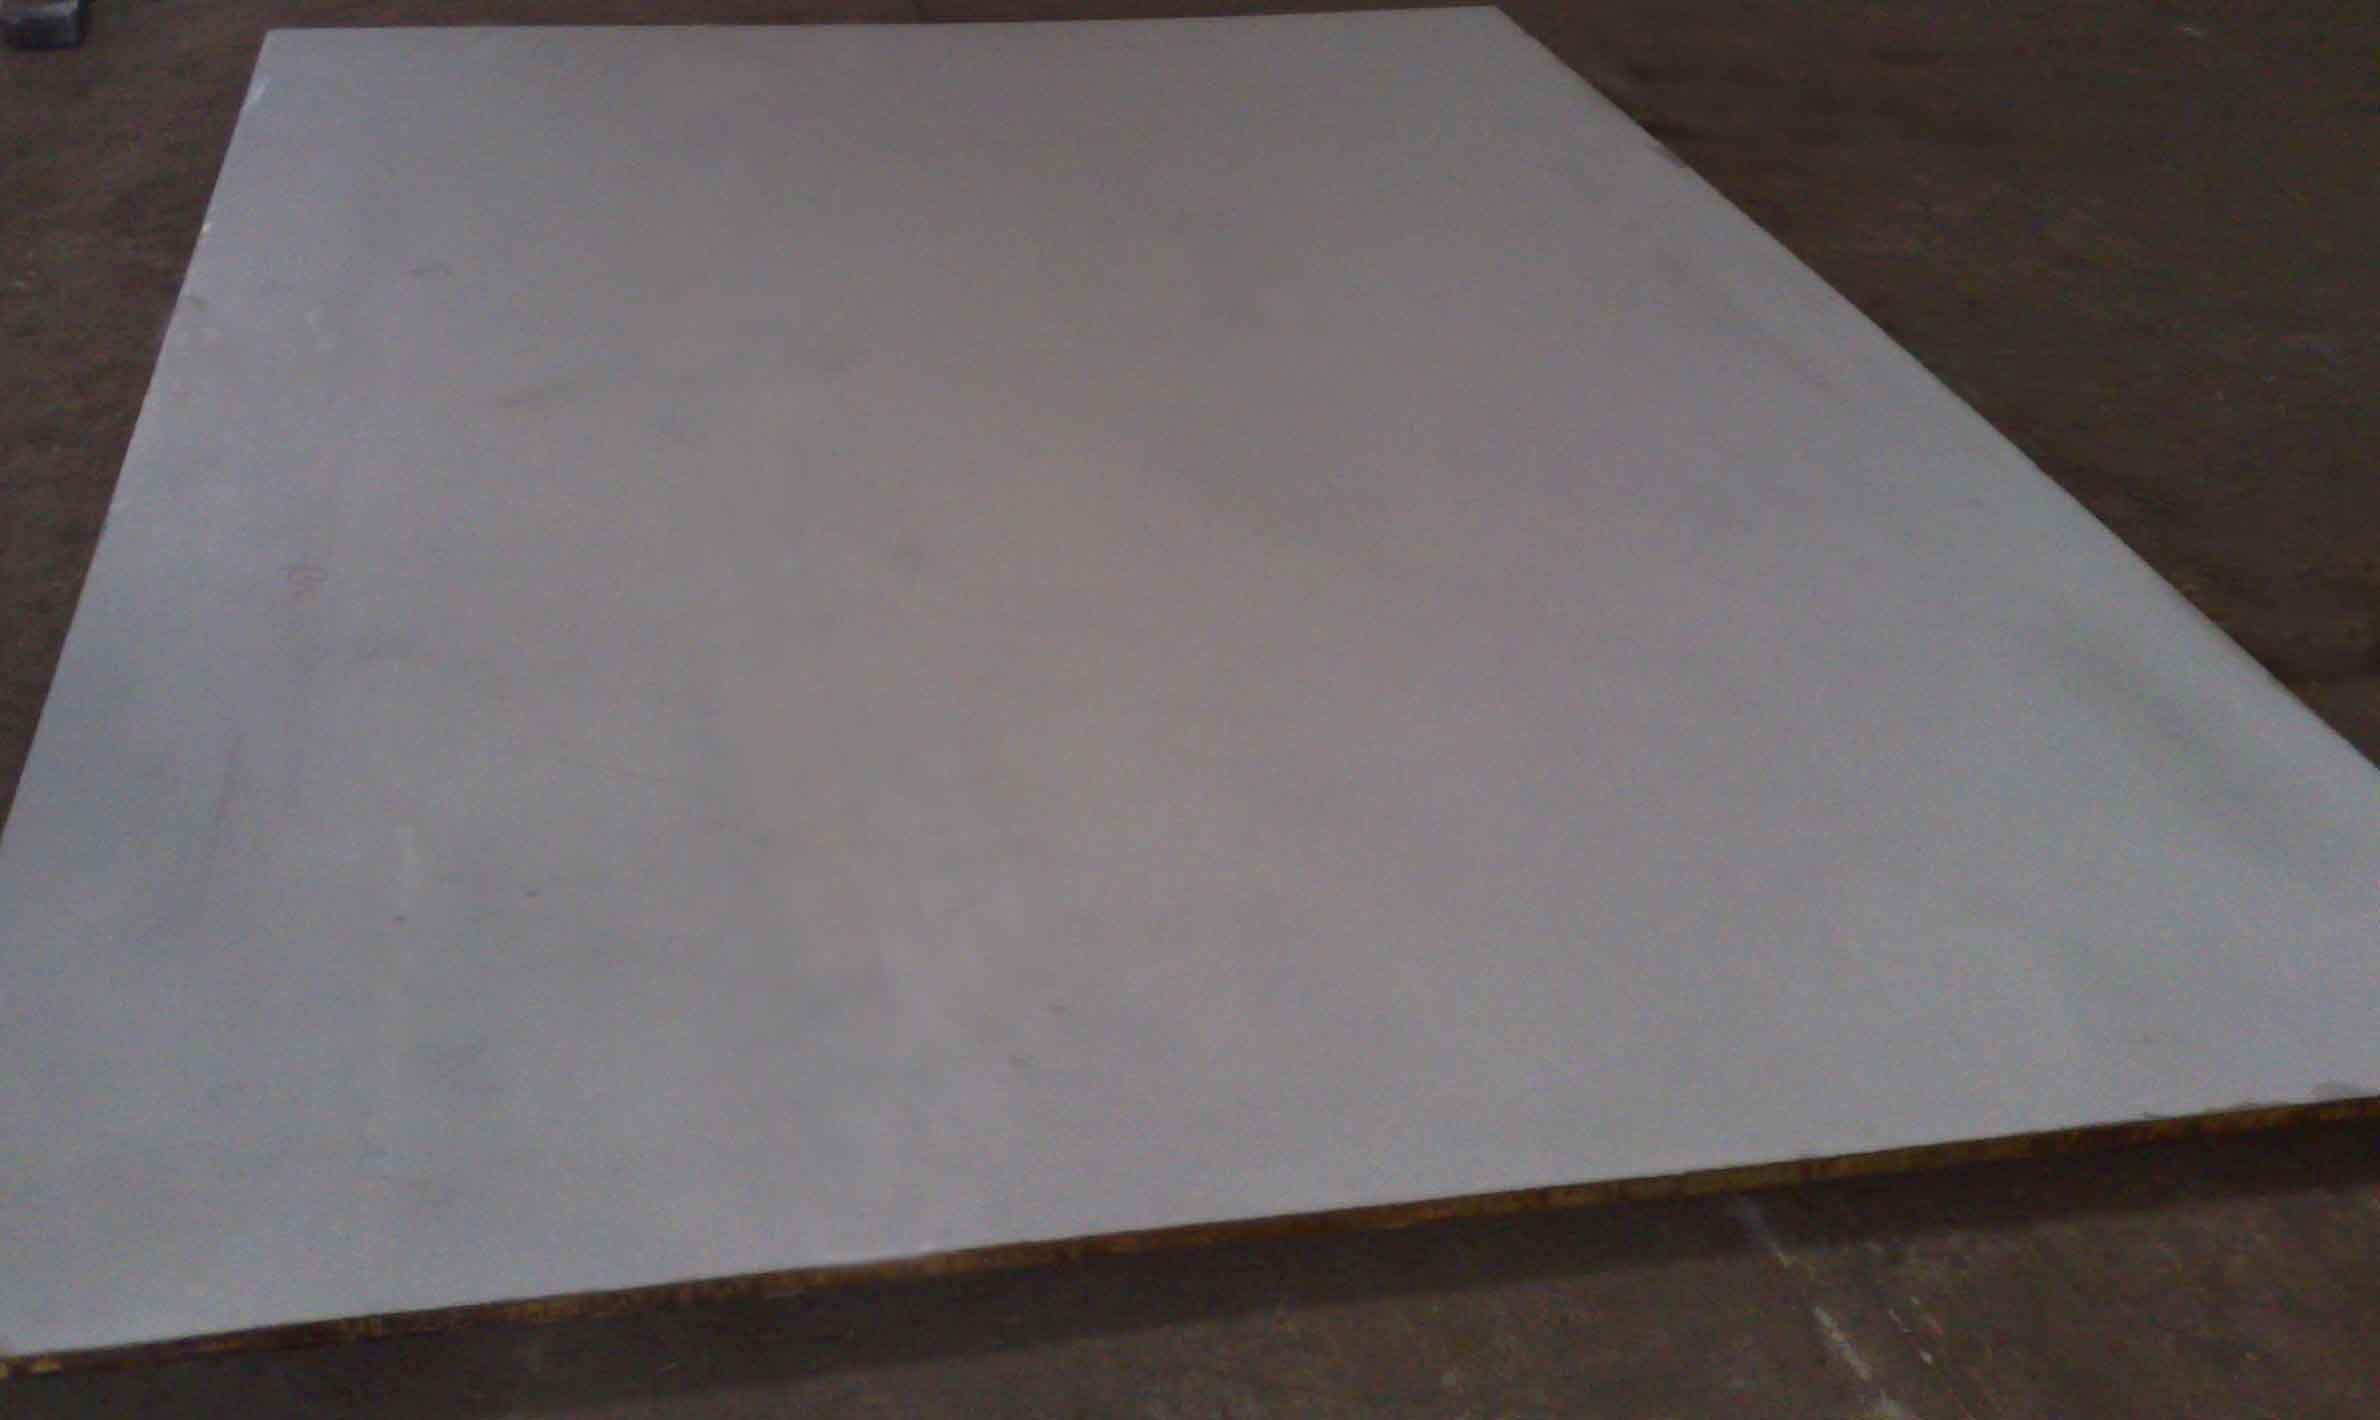 Placa de acero del carb n metal stainless placa de acero for Placa de acero